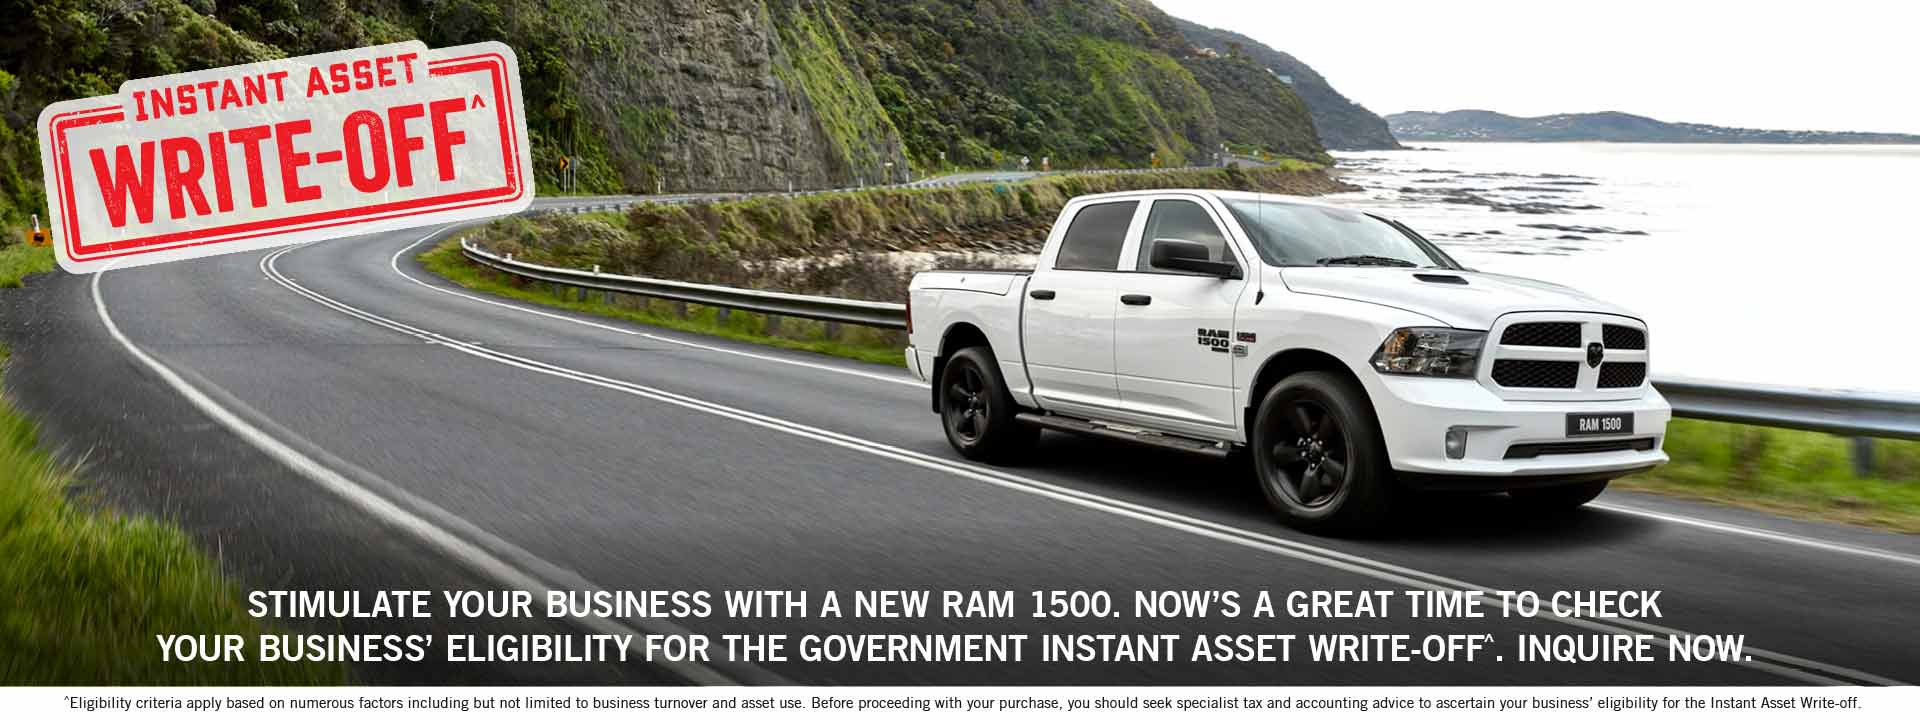 RAM 1500 V8 Hemi Express Crew Cab |Instant Asset Write Off | Ram Trucks Australia